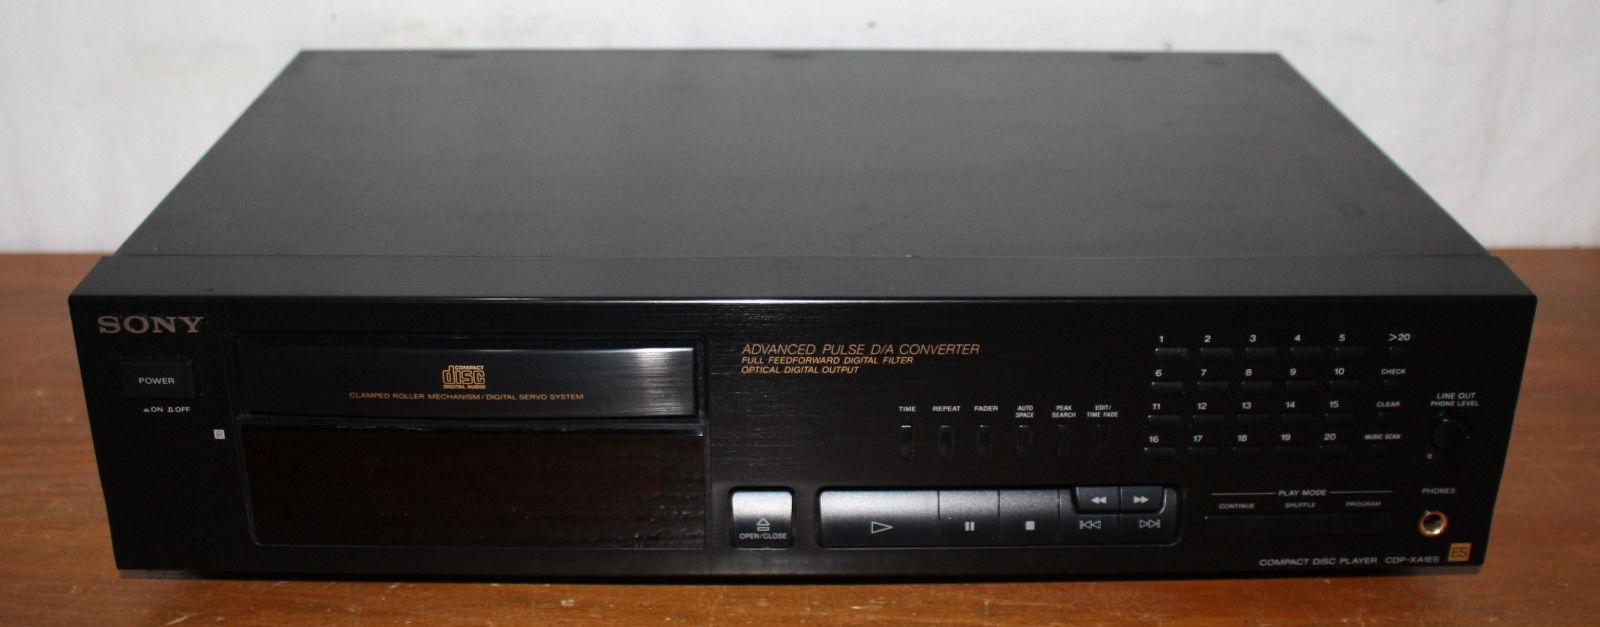 BROKEN - Sony Compact Disc Player CDP-XA1ES, ES Elevated Standard Series, CD